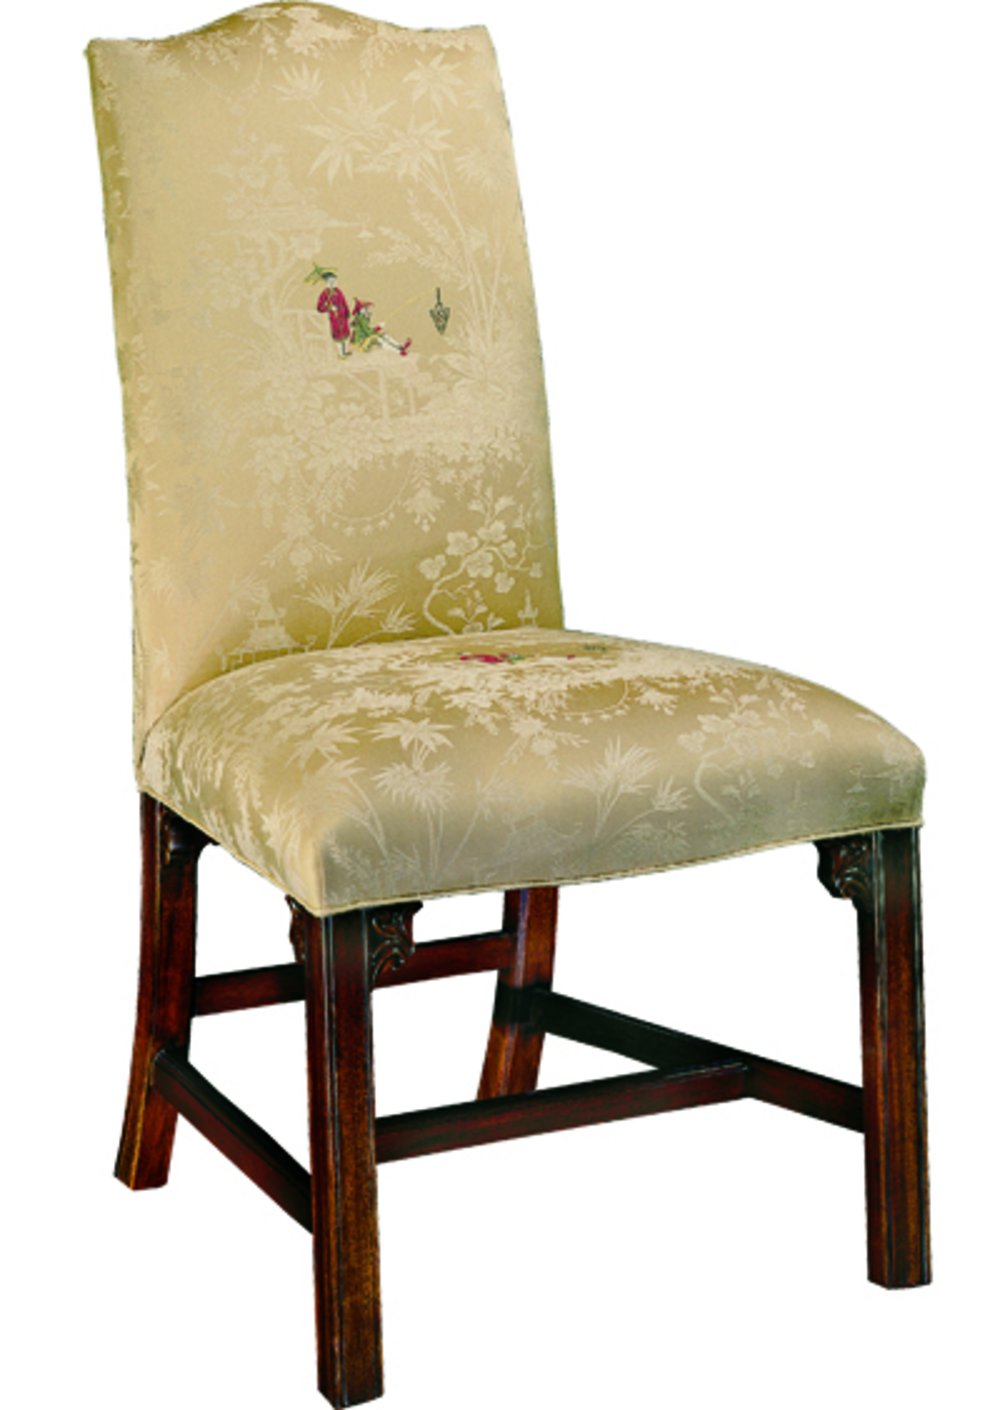 Henkel-Harris - Upholstered Side Chair